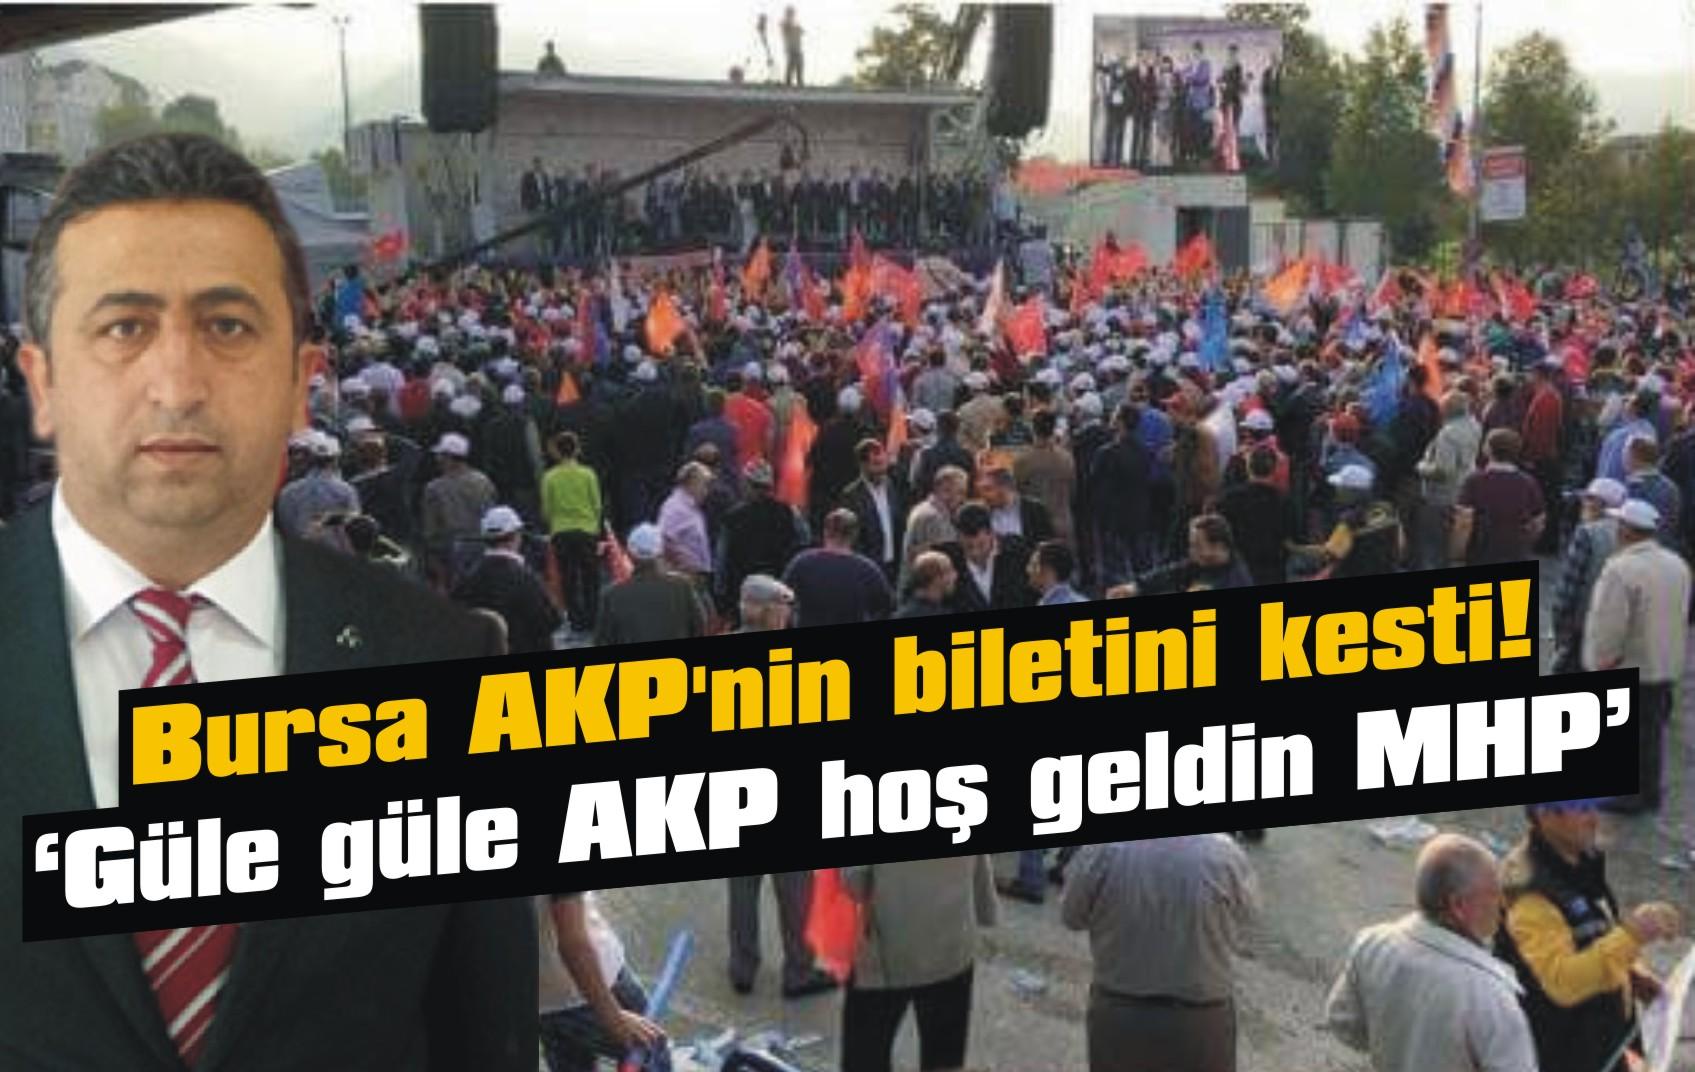 Bursa AKP'nin biletini kesti